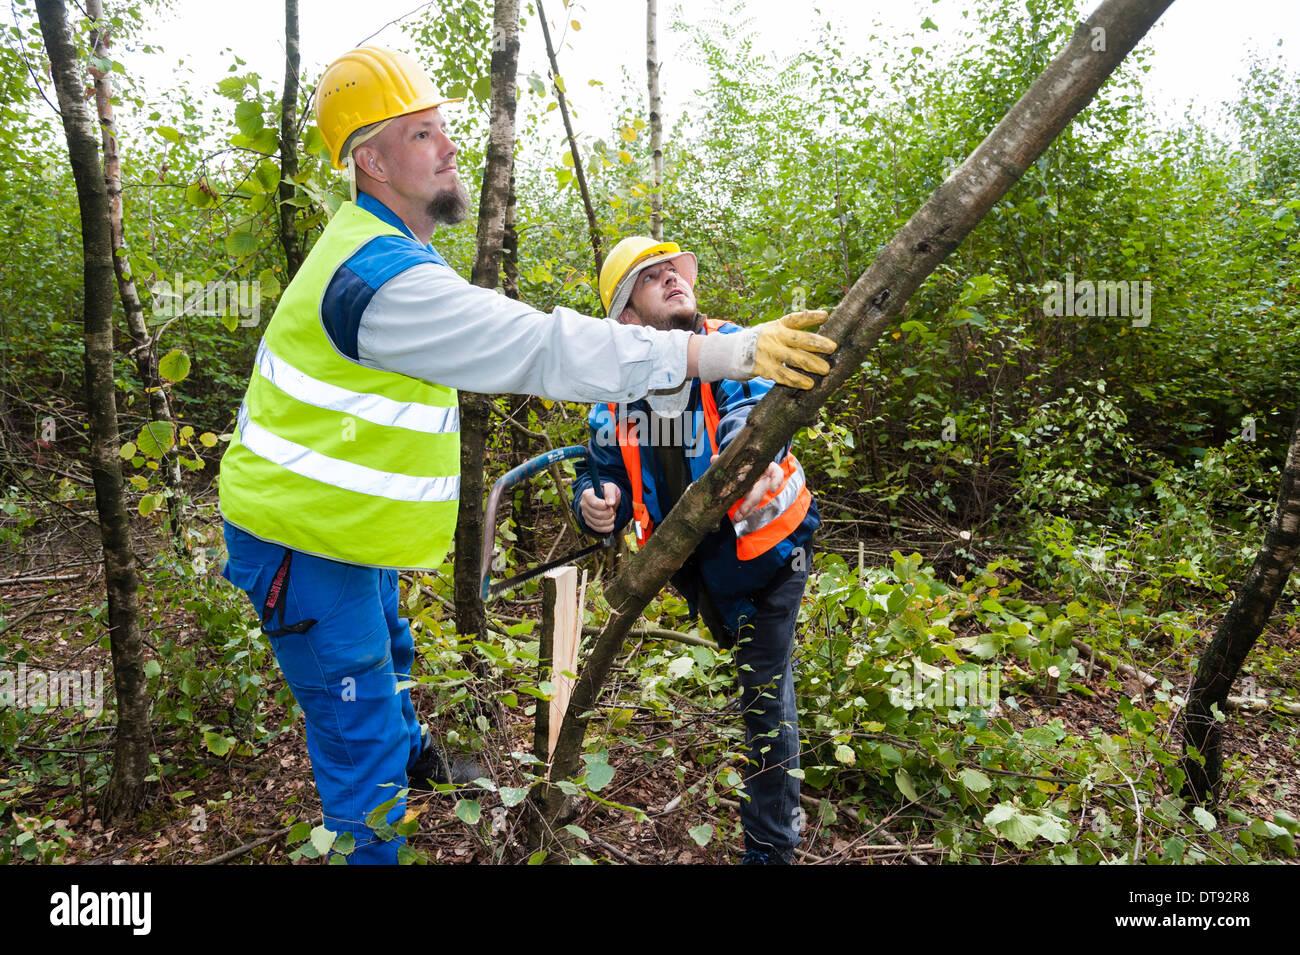 Two young lumberjacks cut down a birch tree. Stock Photo